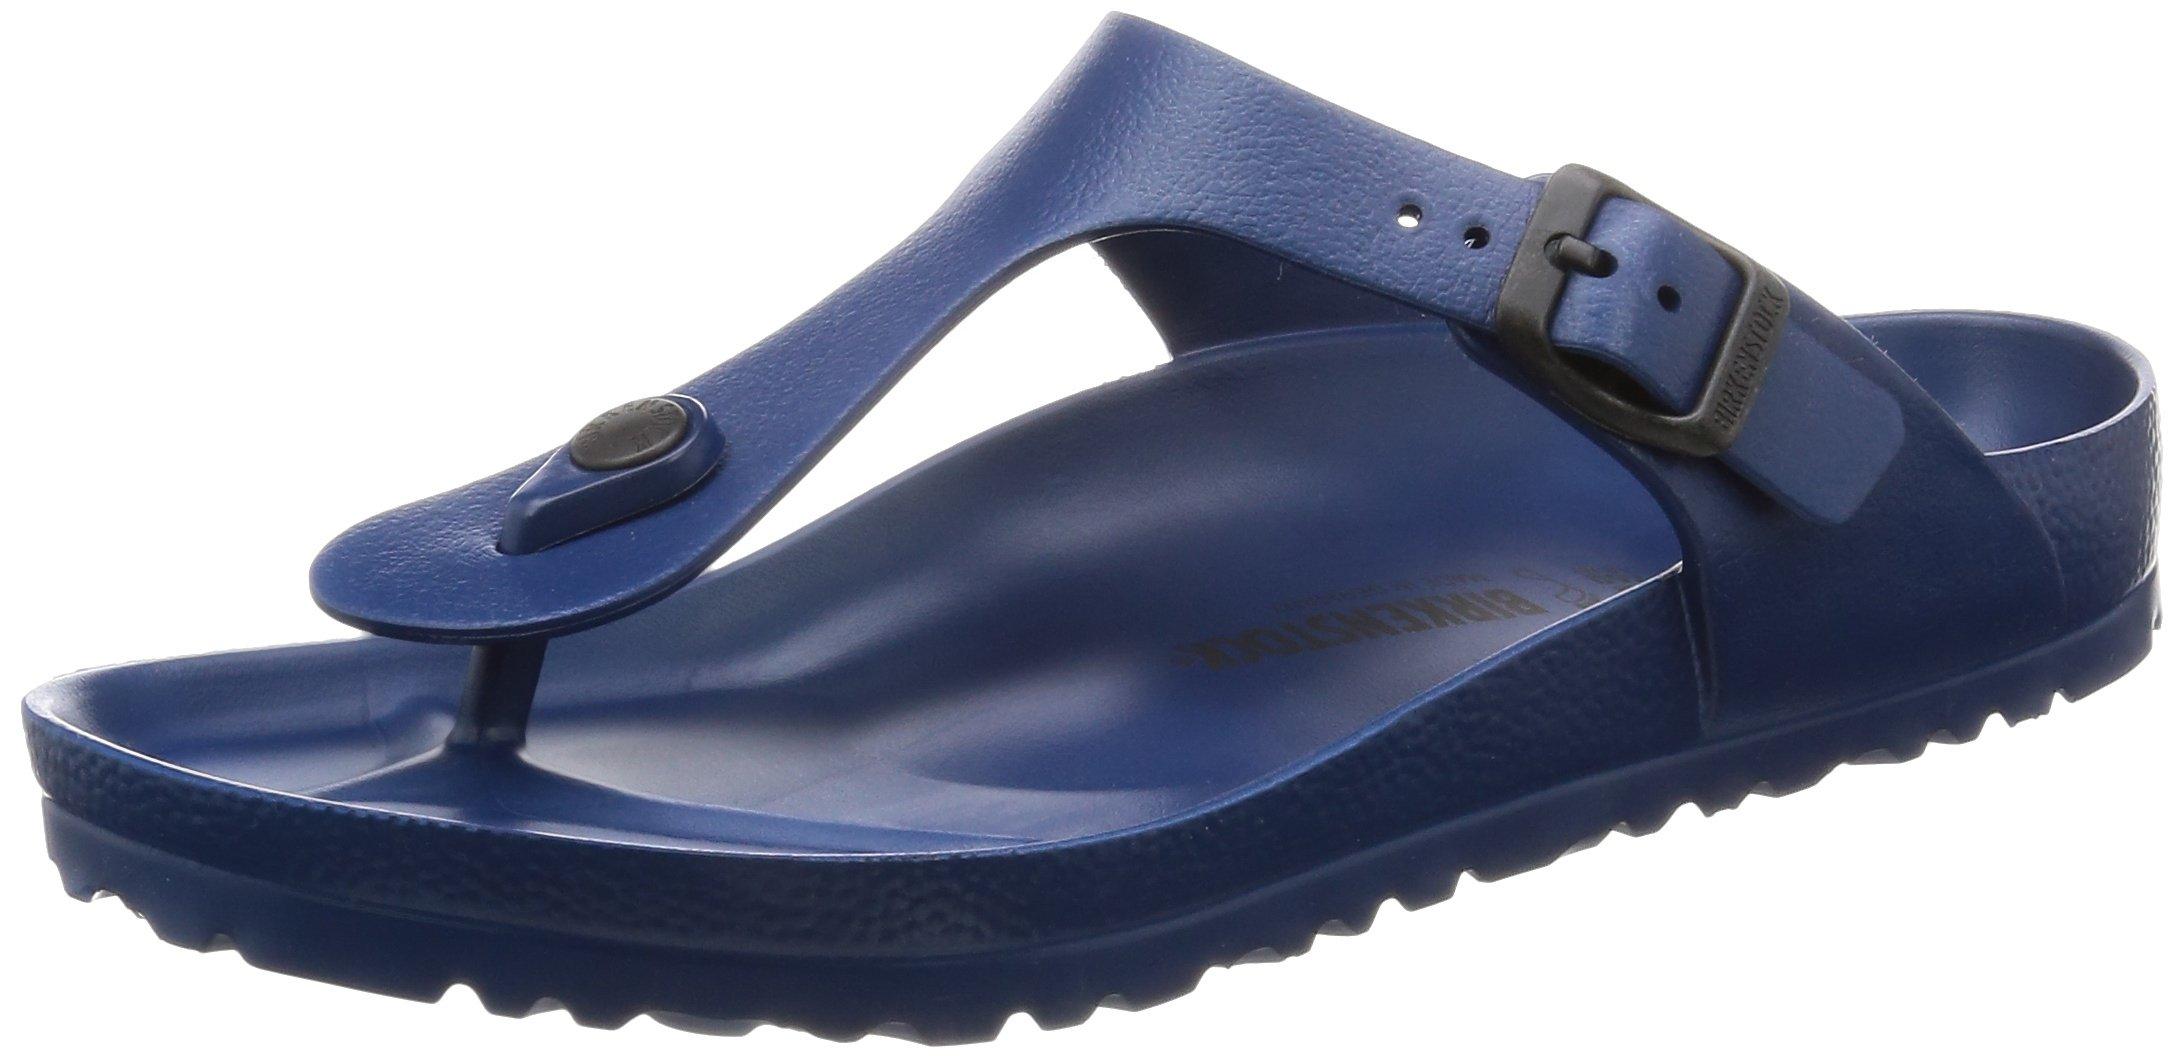 Birkenstock Womens Gizeh EVA Sandals Navy Size 43 M EU